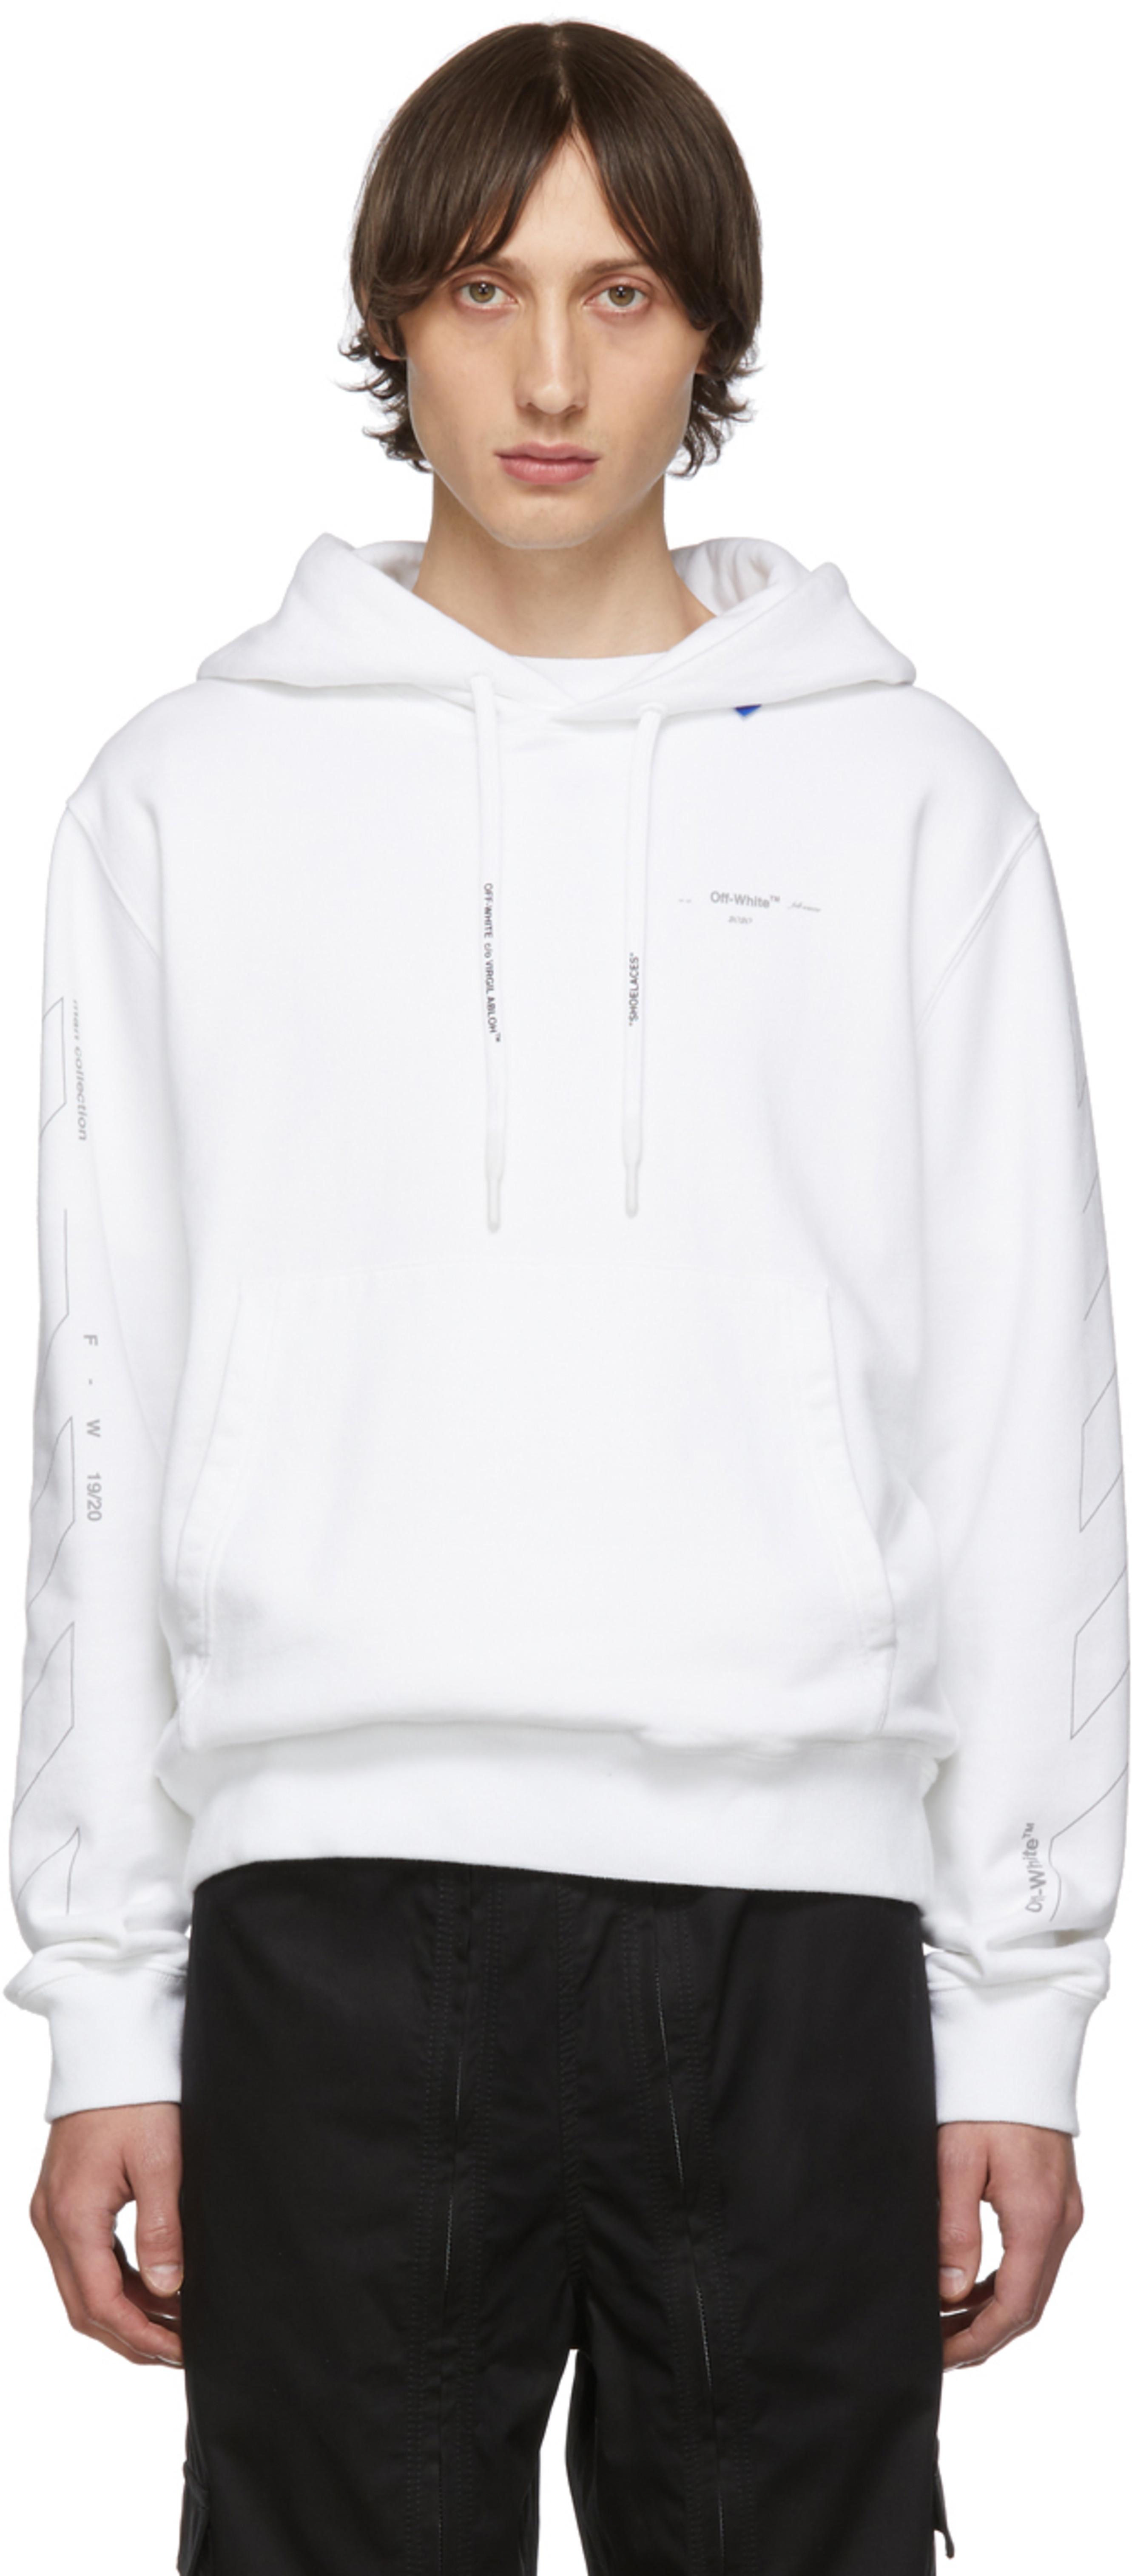 da06829d2 Off-white for Men SS19 Collection   SSENSE